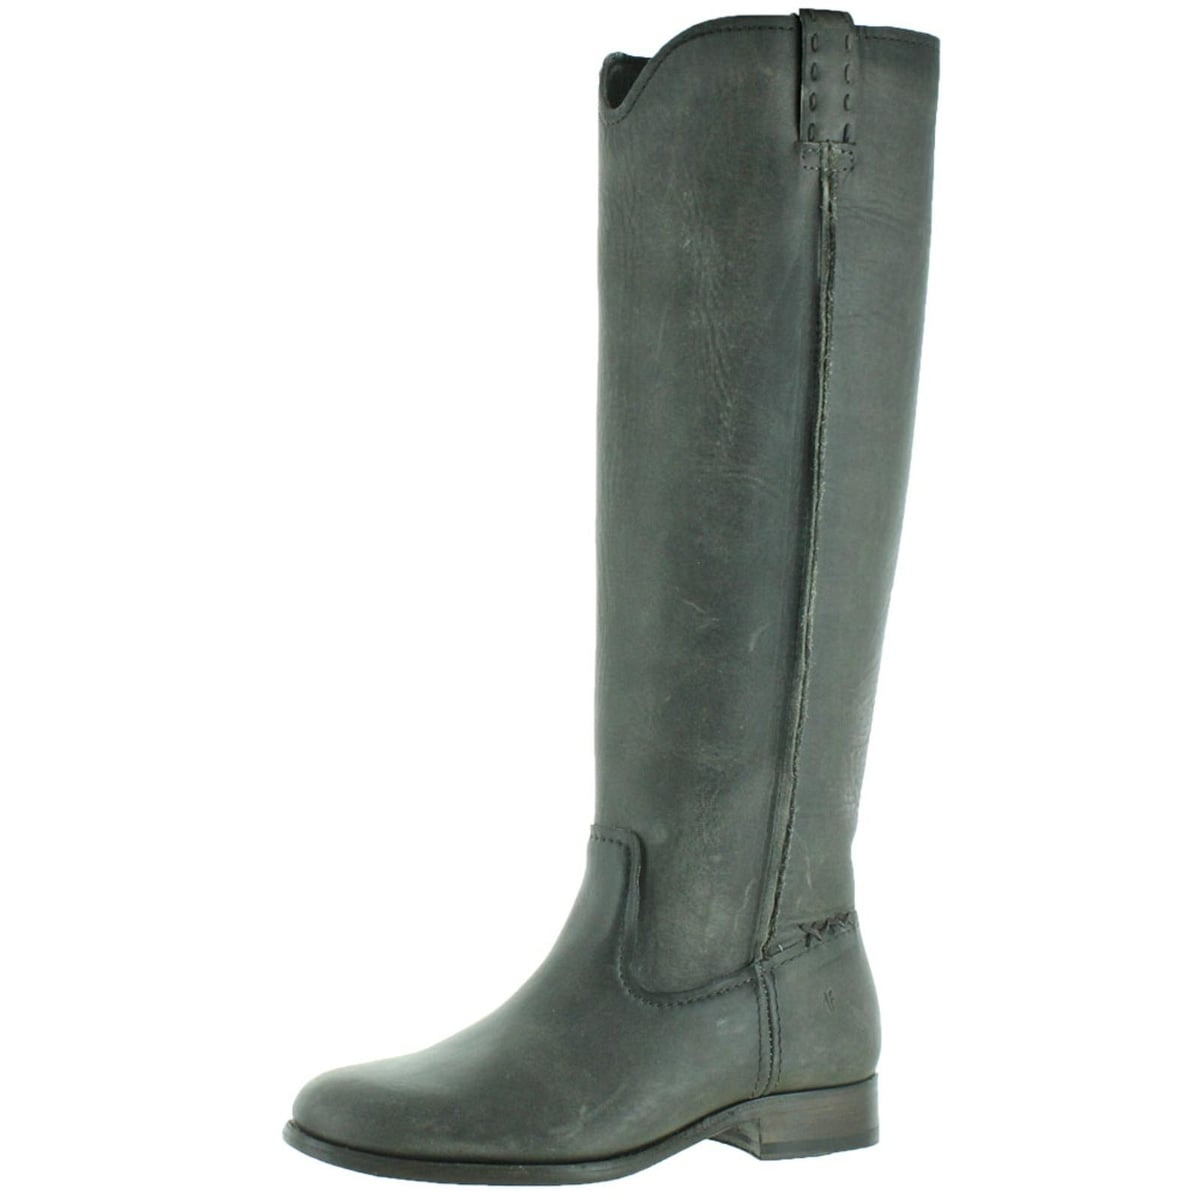 Overstock frye boots